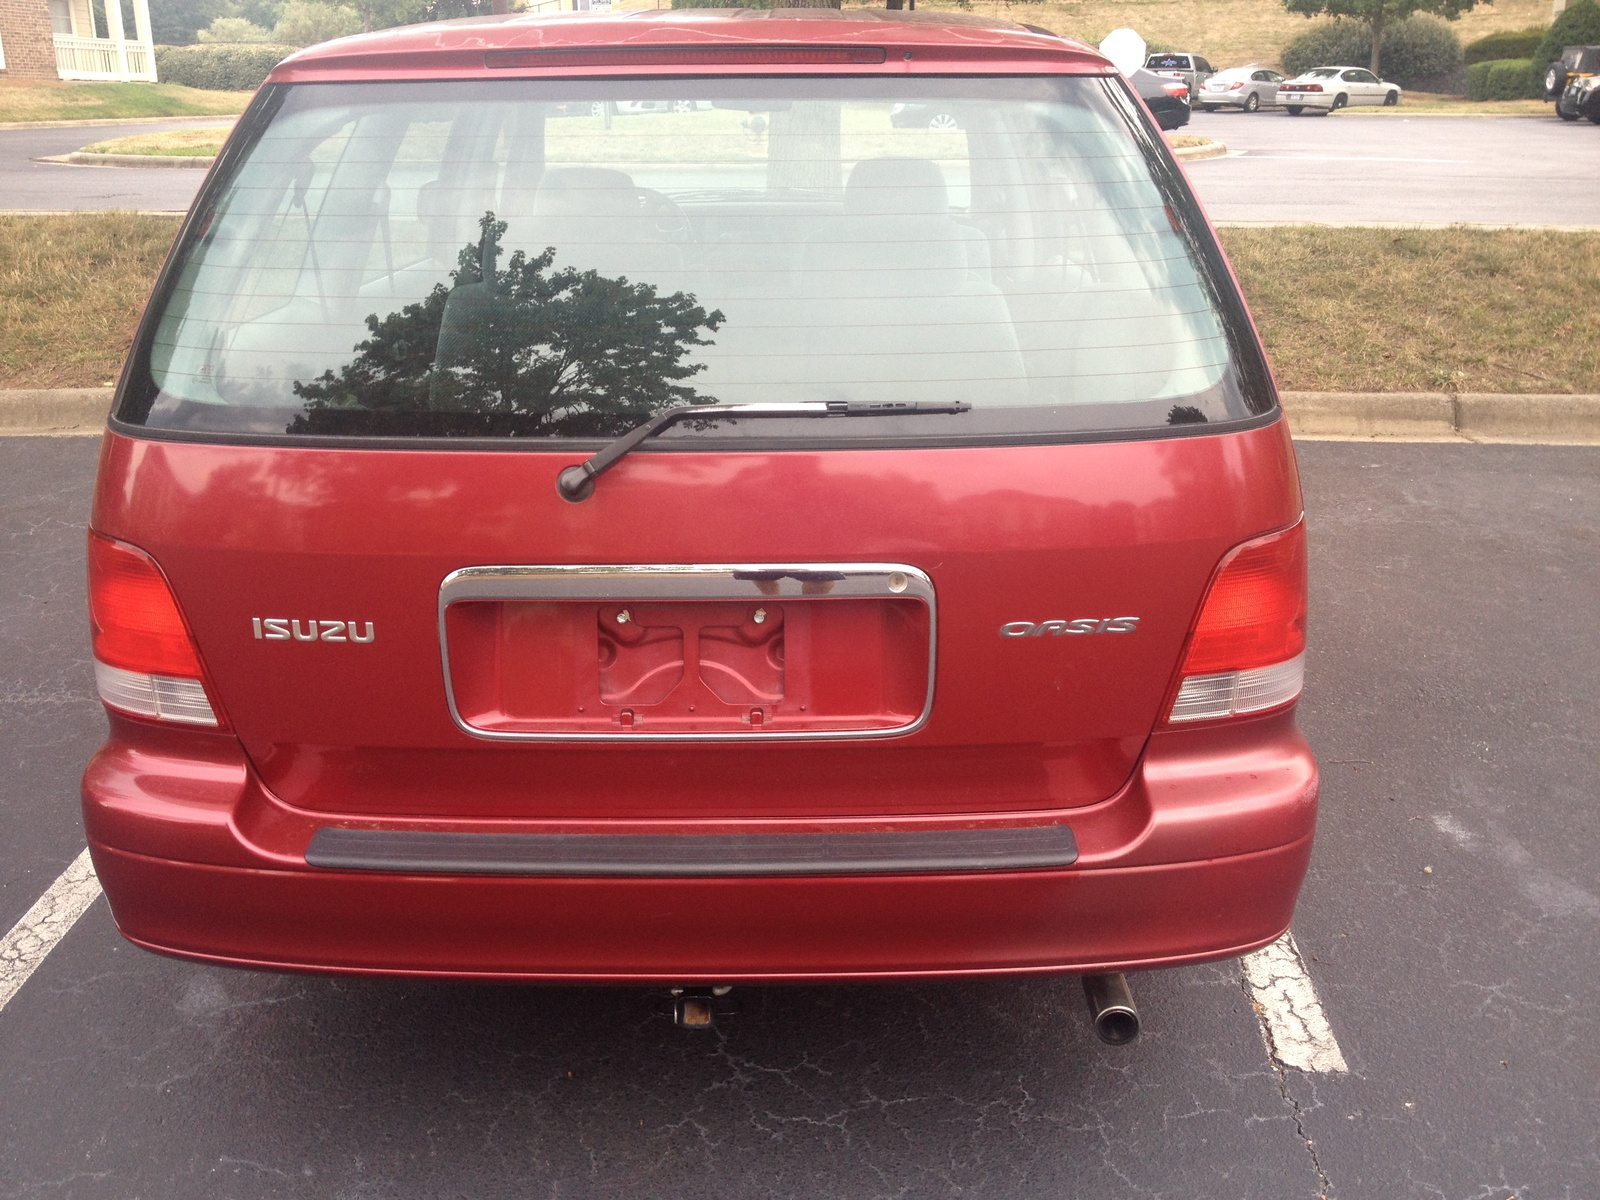 Nissan Passenger Van >> Isuzu Oasis - Overview - CarGurus